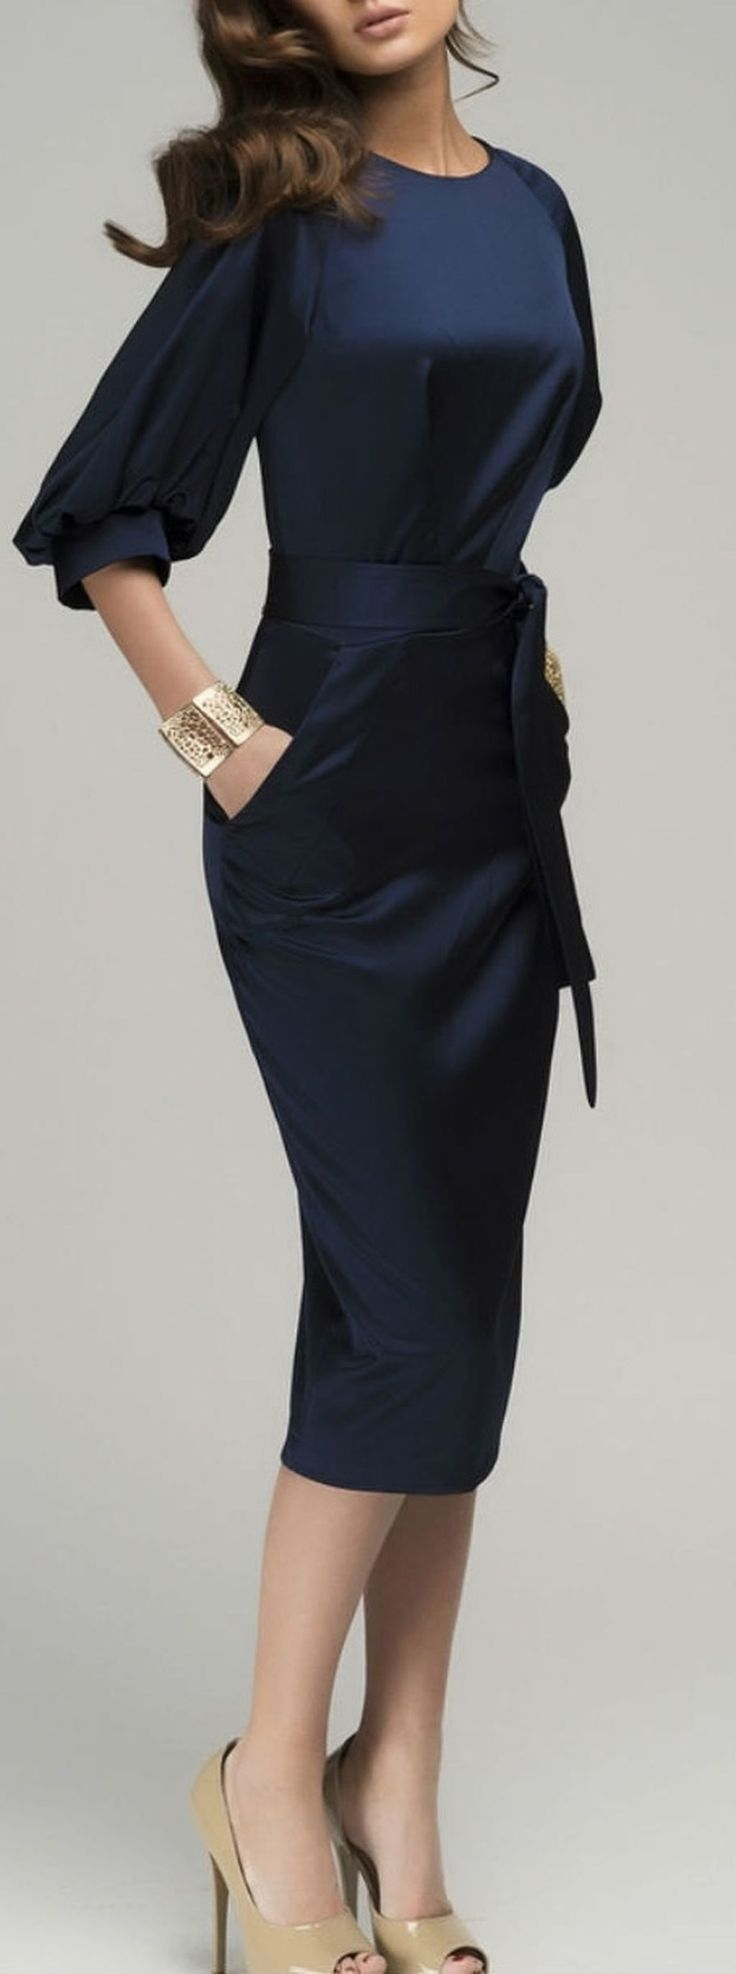 Simple but gorgeous professional work dresses ideas 32